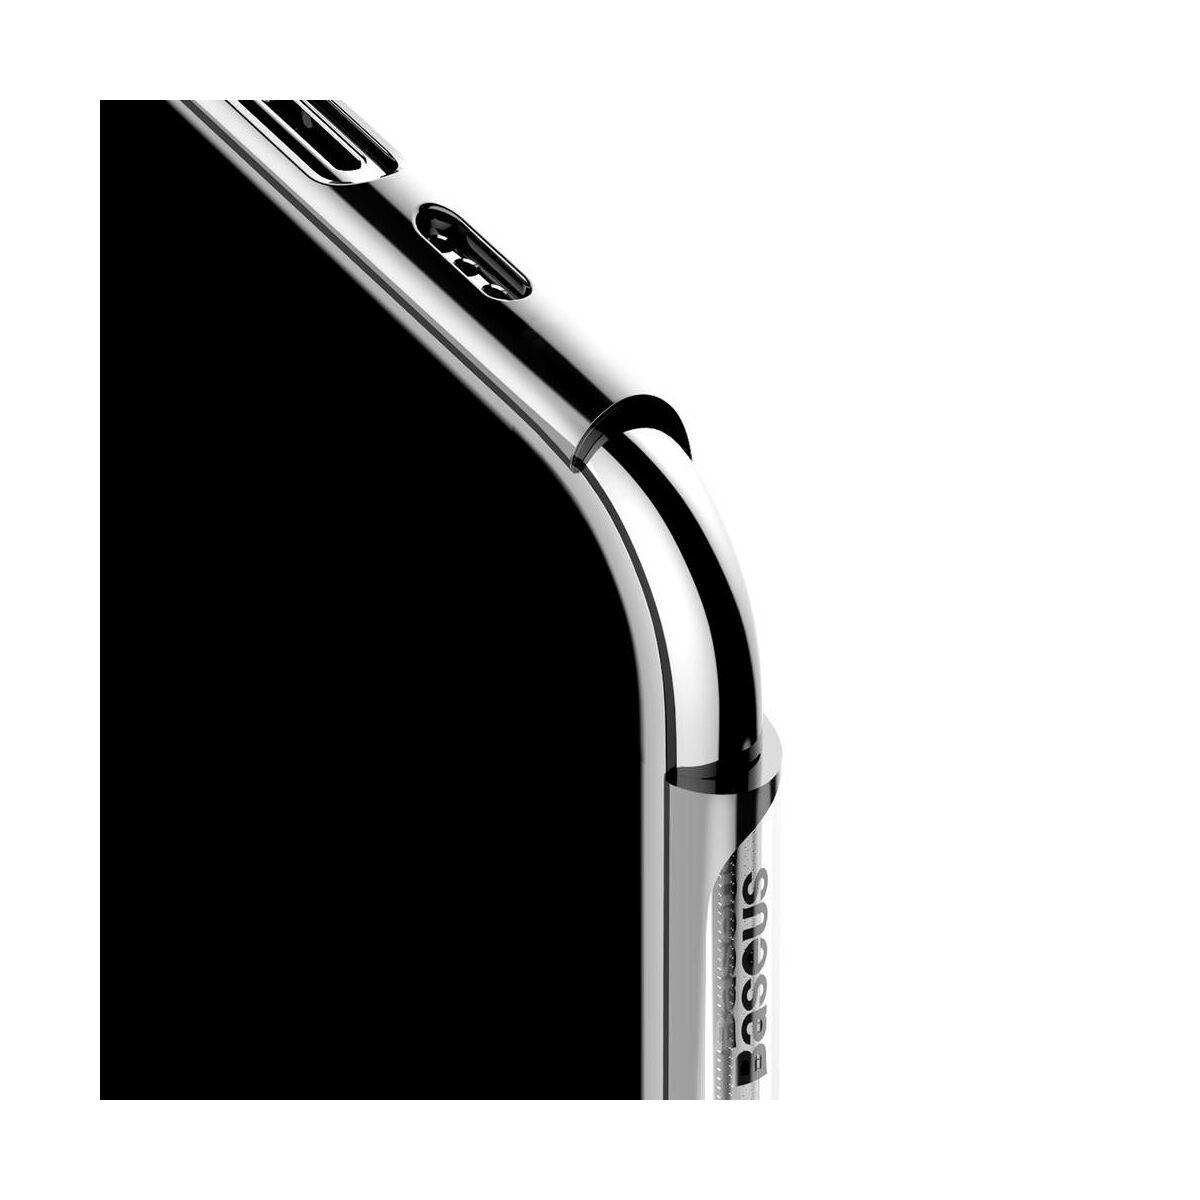 Baseus iPhone 11 Pro Max tok, Glitter, ezüst (WIAPIPH65S-DW0S)